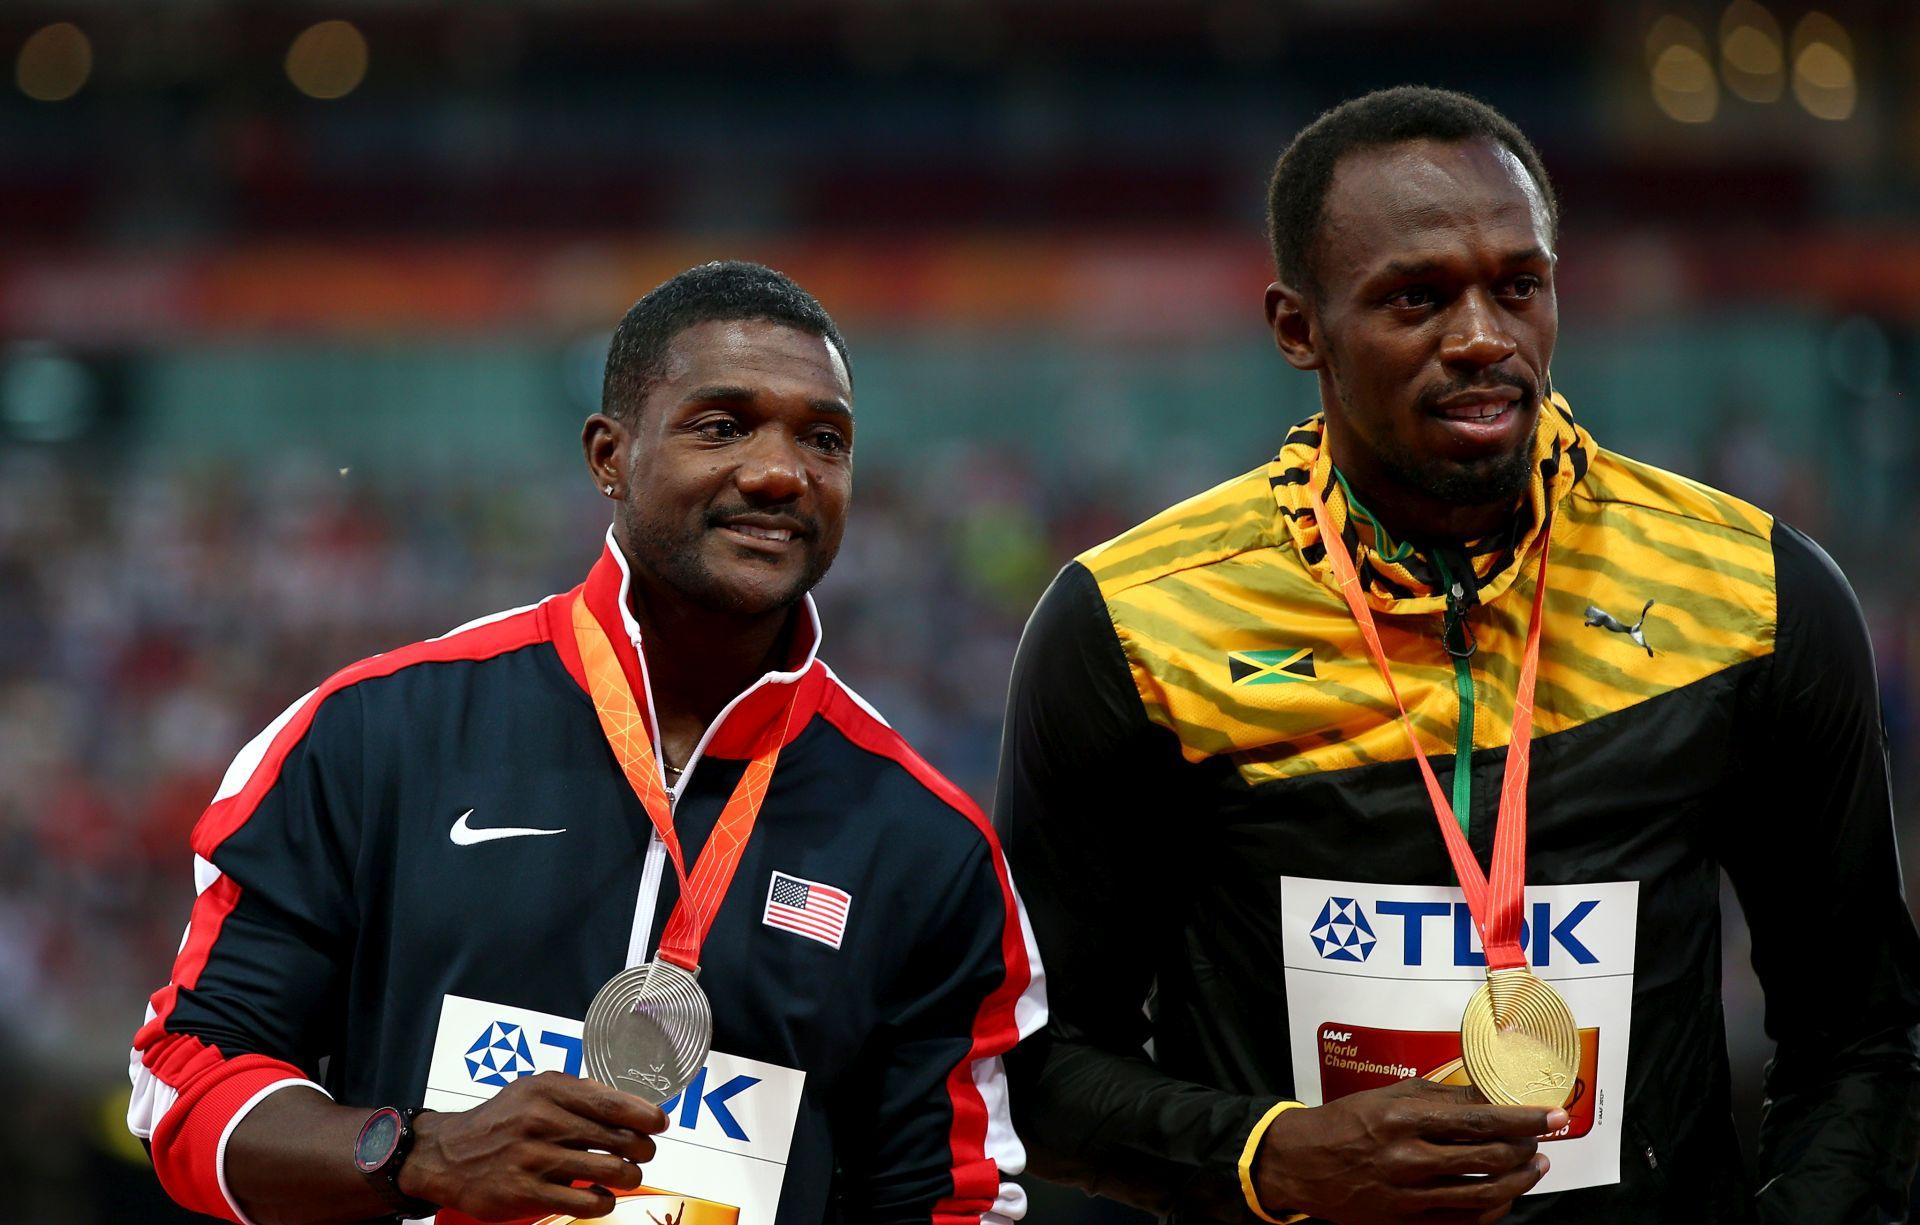 NOVA 'BITKA' VEĆ SUTRA Bolt i Gatlin dominirali polufinalima na 200 metara